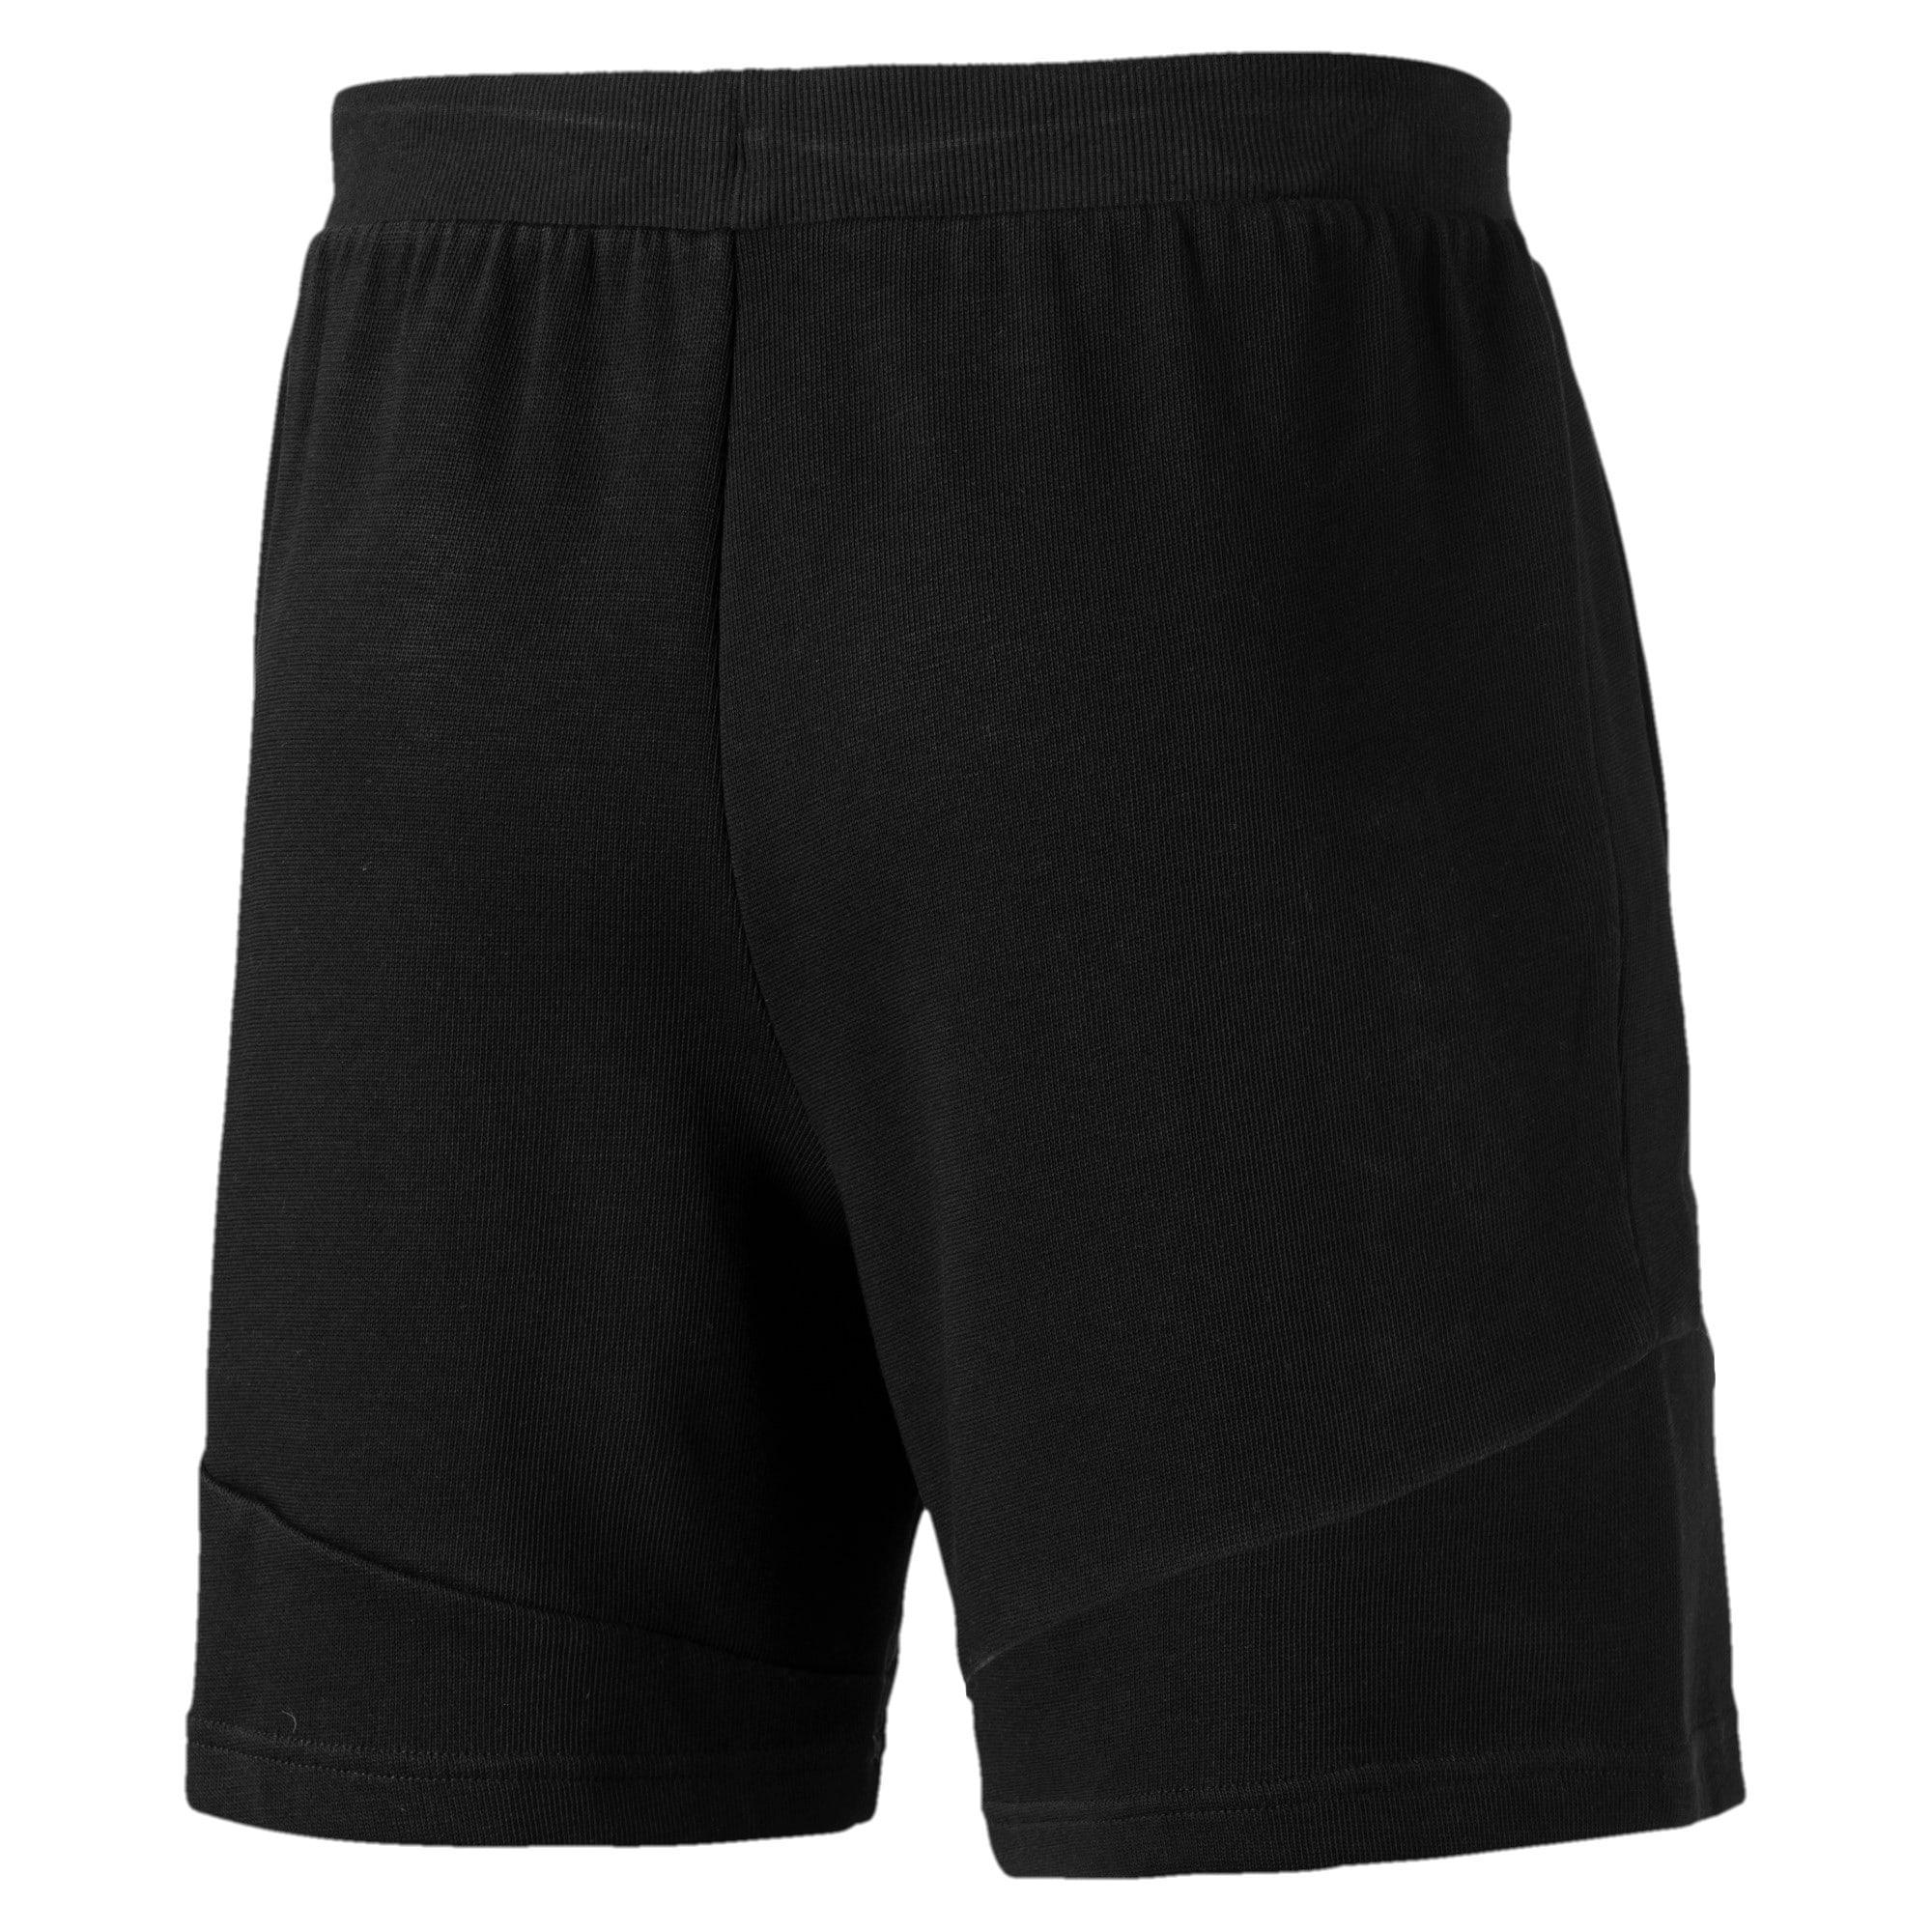 Thumbnail 3 of Ferrari Men's Sweat Shorts, Puma Black, medium-IND